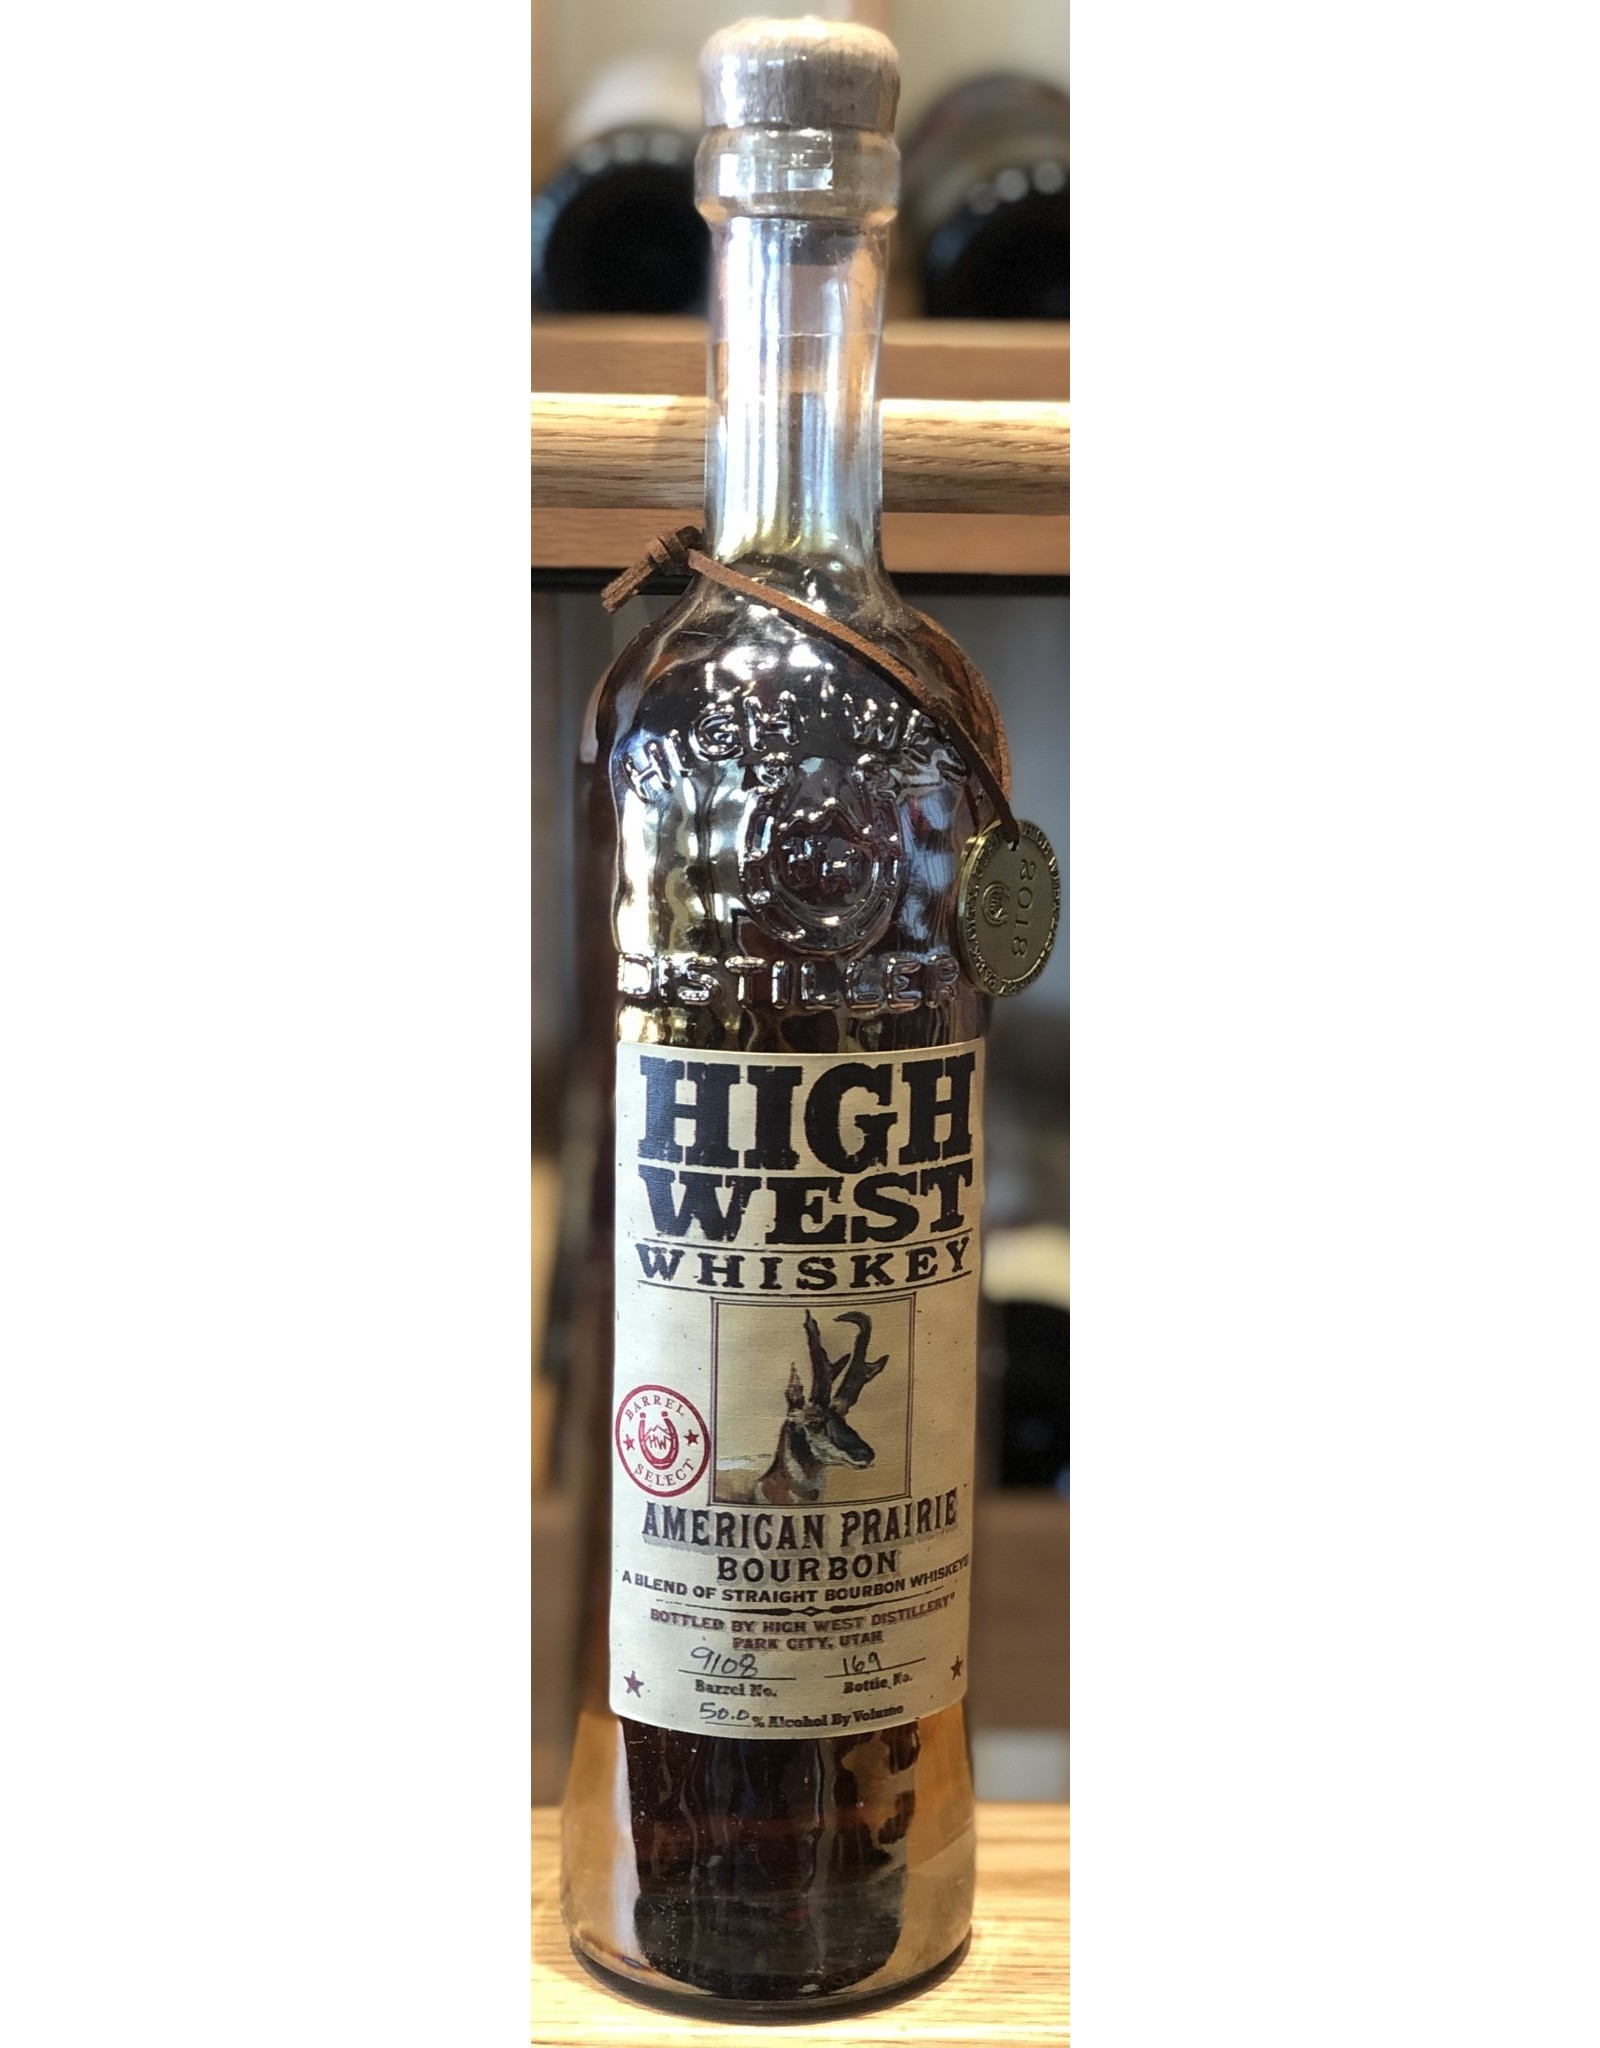 Bern's Select, High West American Prairie, Chard Finish '18